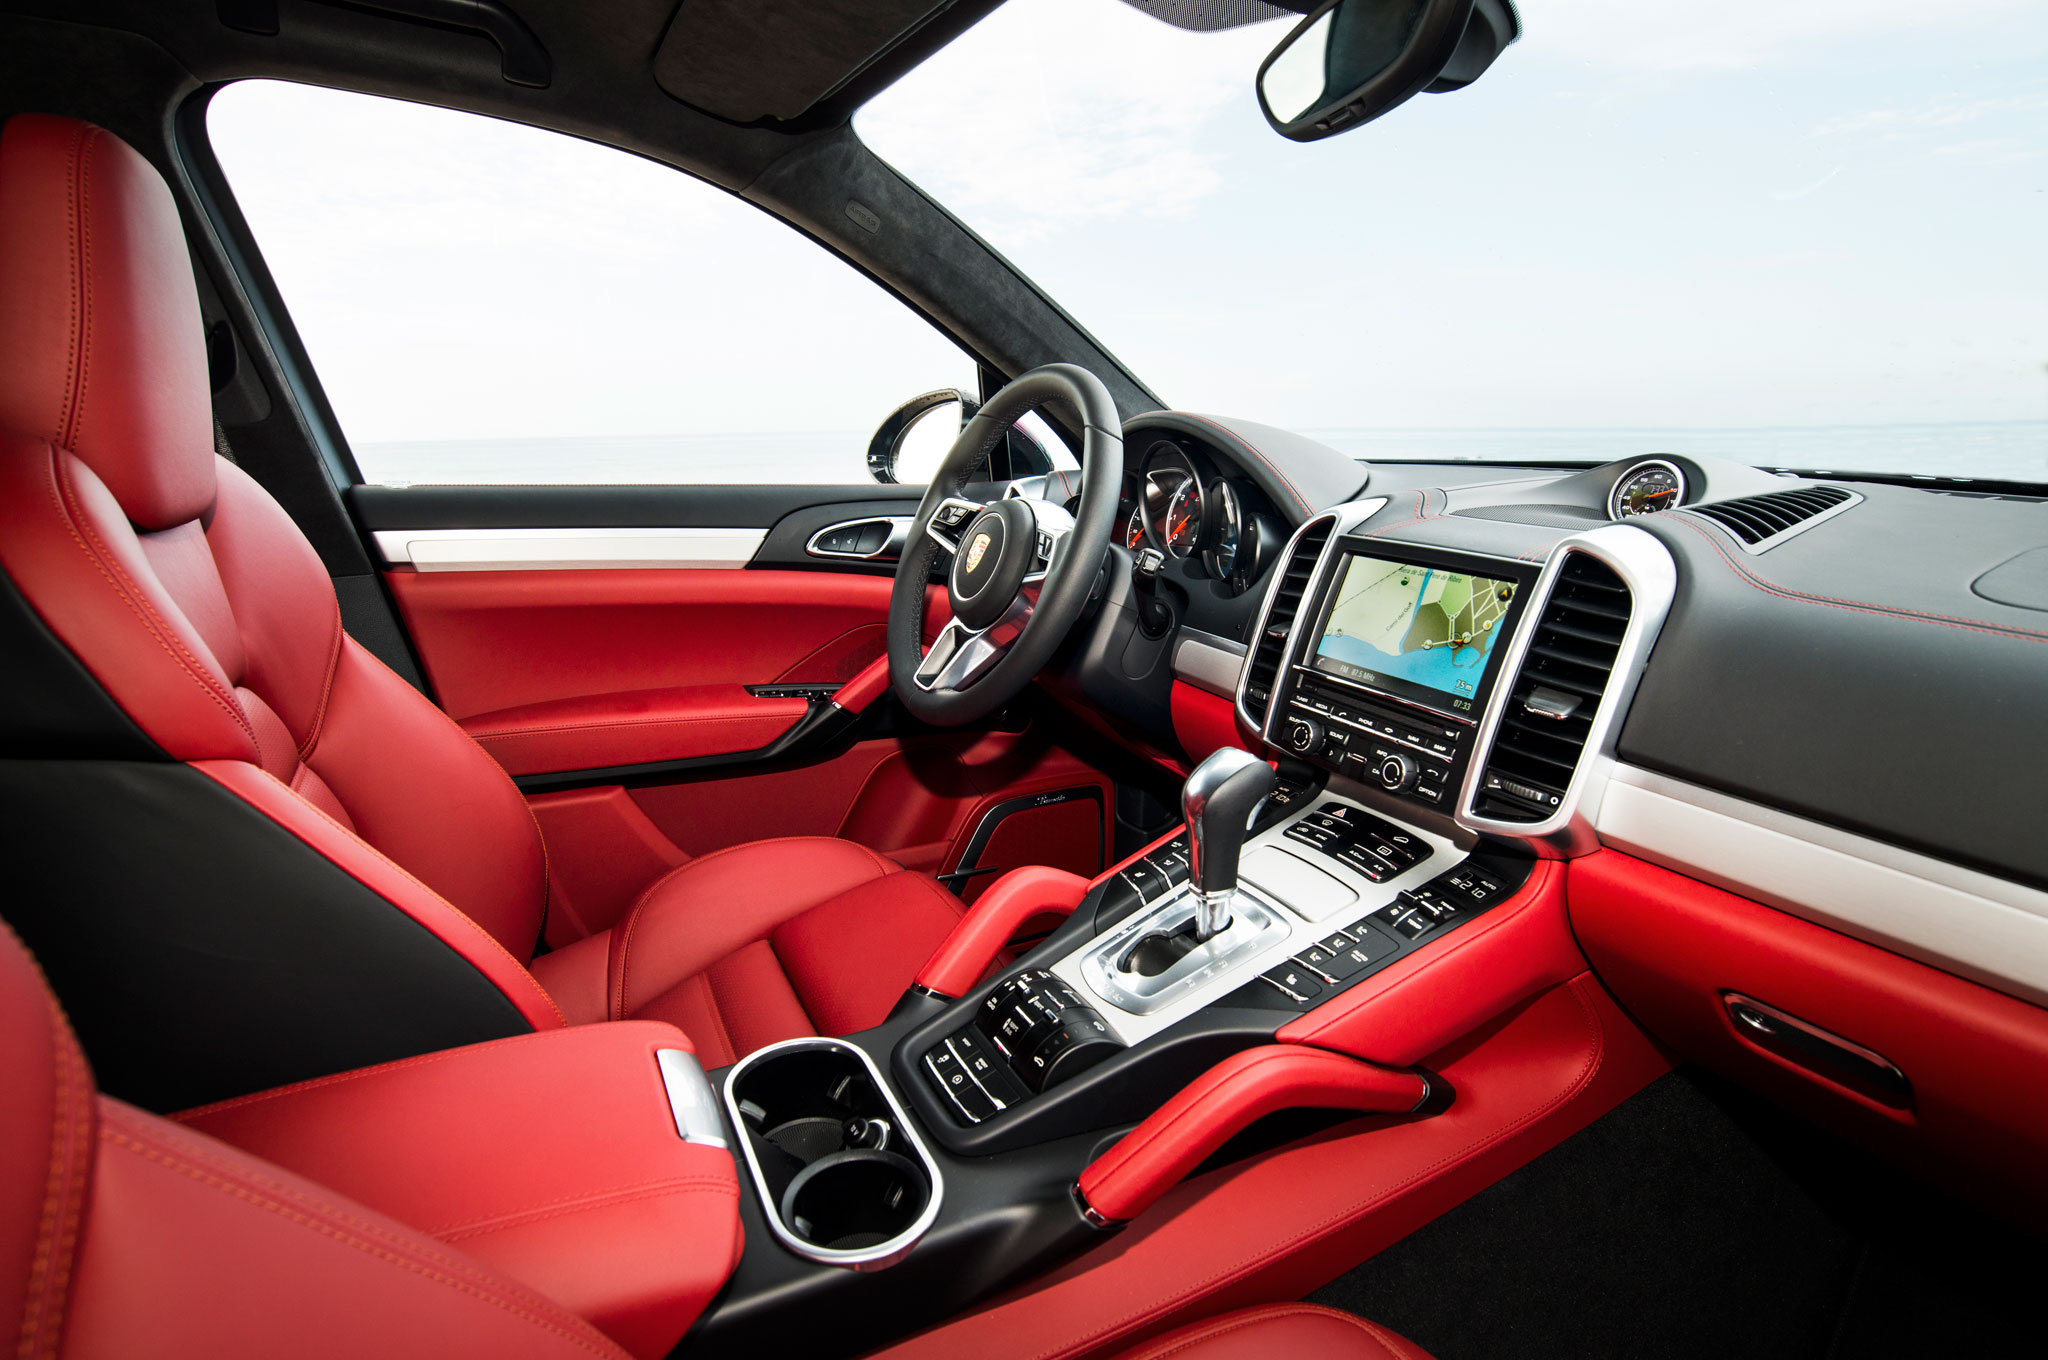 show more - Porsche Cayenne Turbo